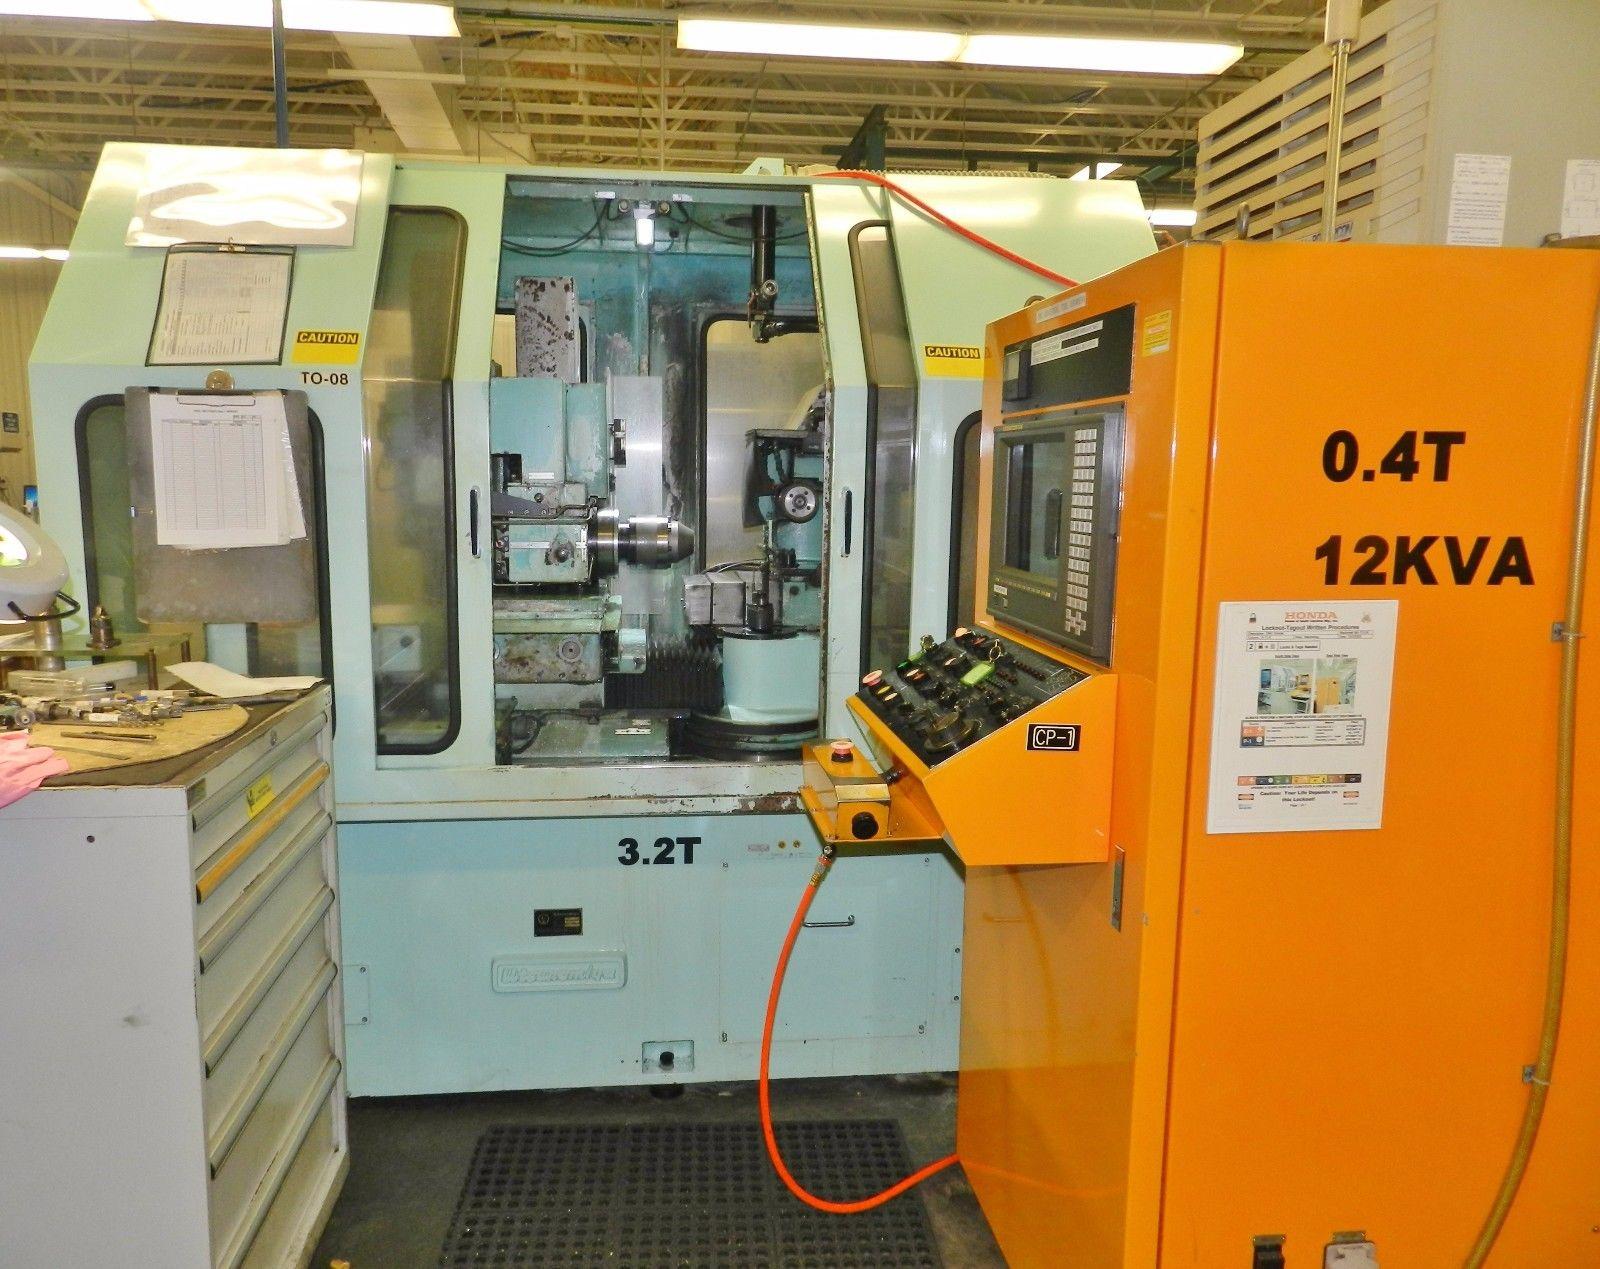 Lot 25 - 6-Axis CNC Tool Cutter Machine w/Fanuc Control